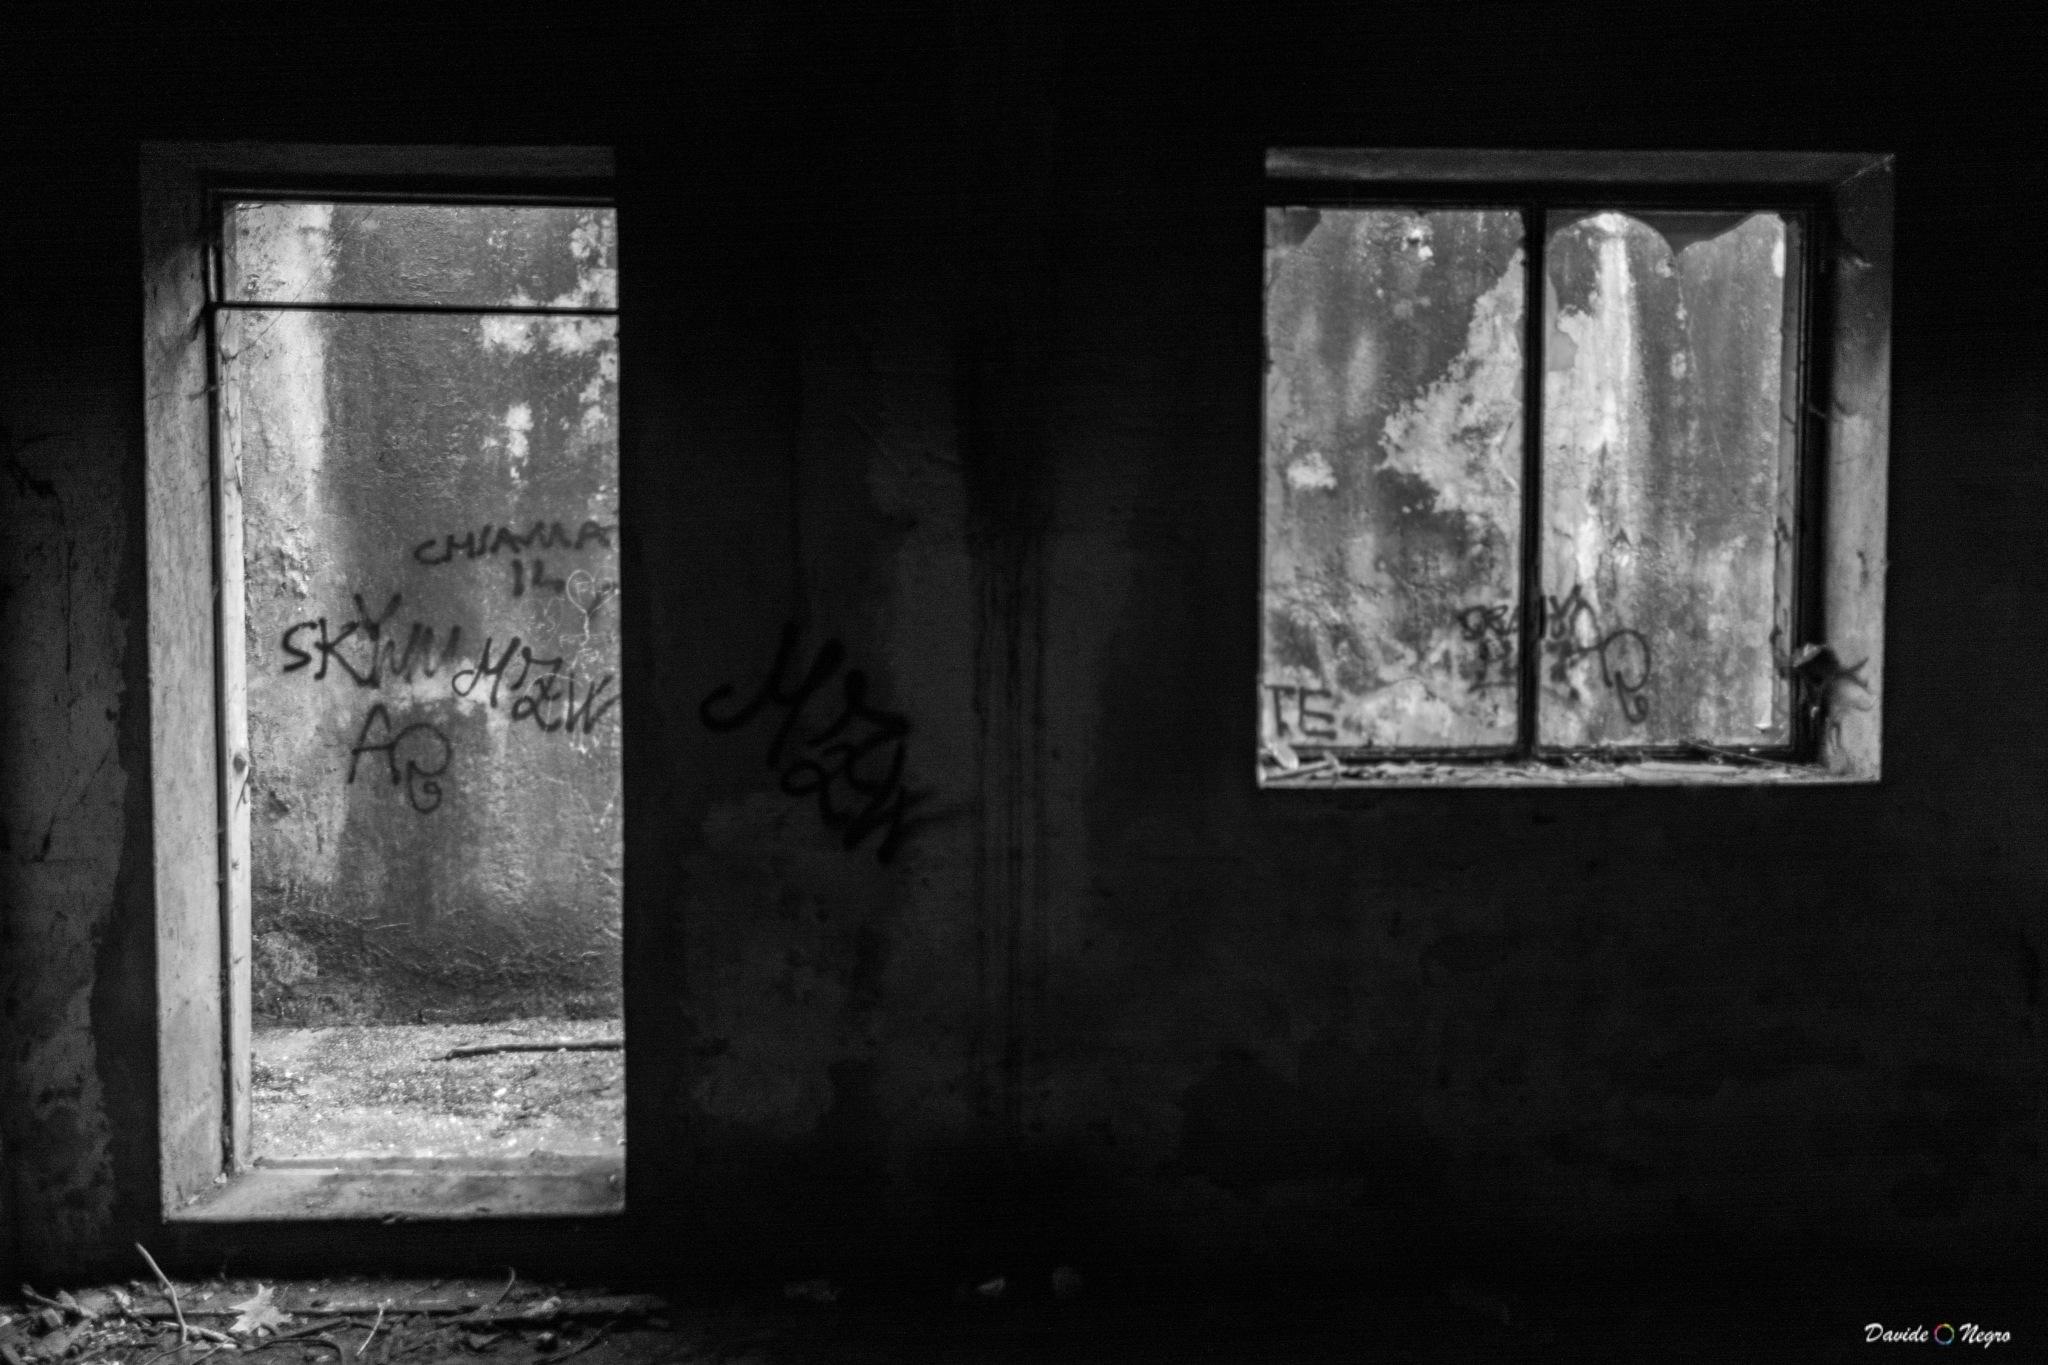 bn by DavideNegro